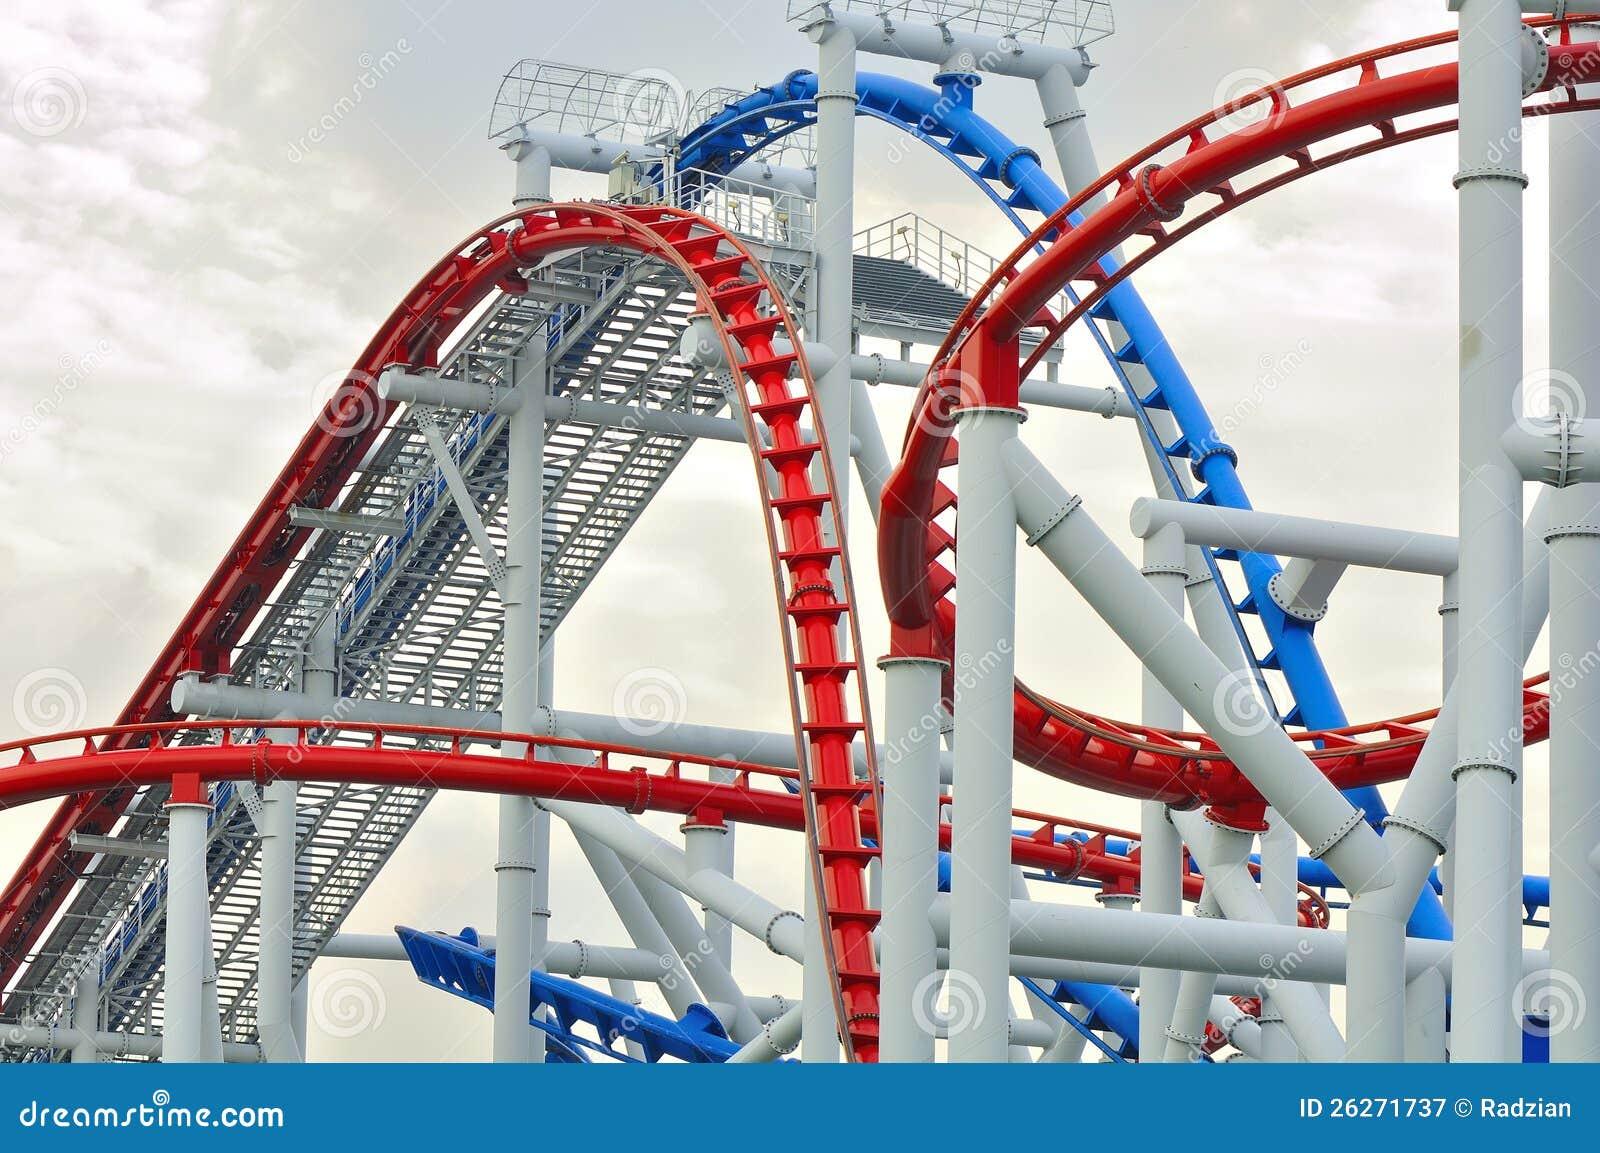 Universal Studio Singapore Roller Coaster Editorial